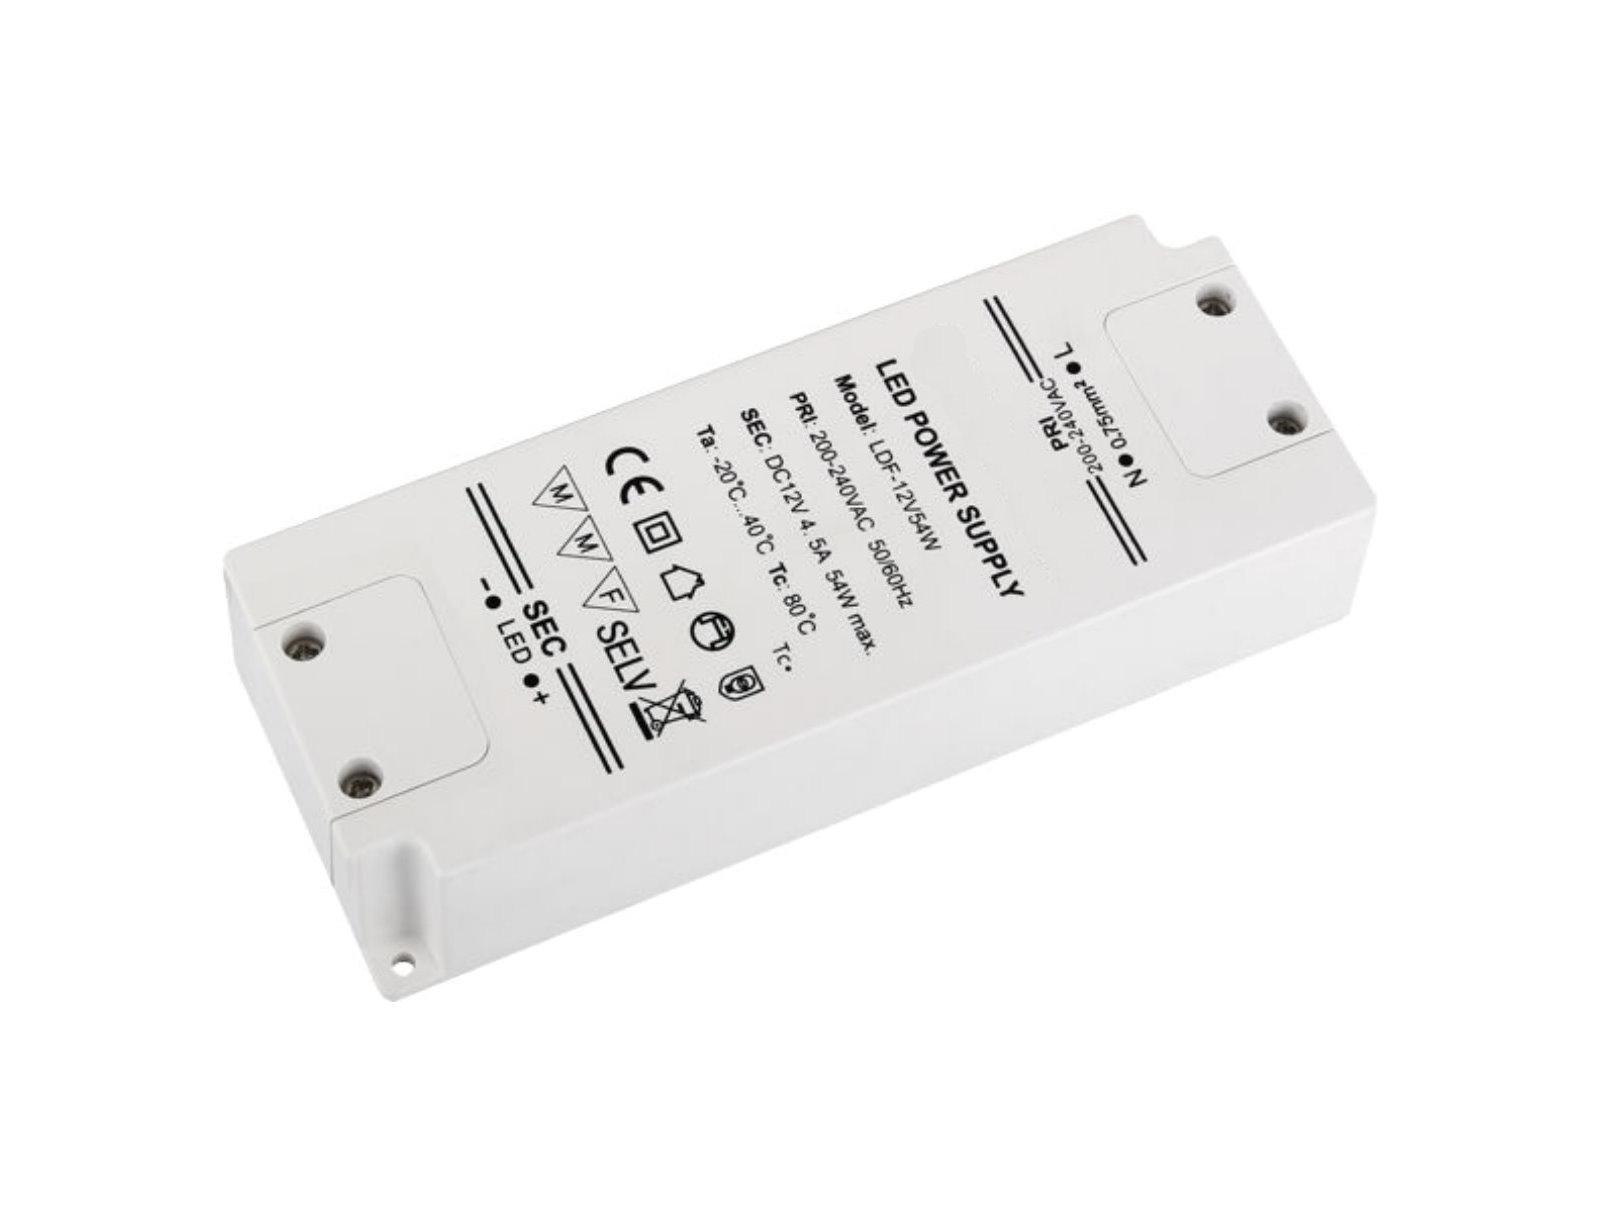 LED Transformator Kompakt 12V - 54W